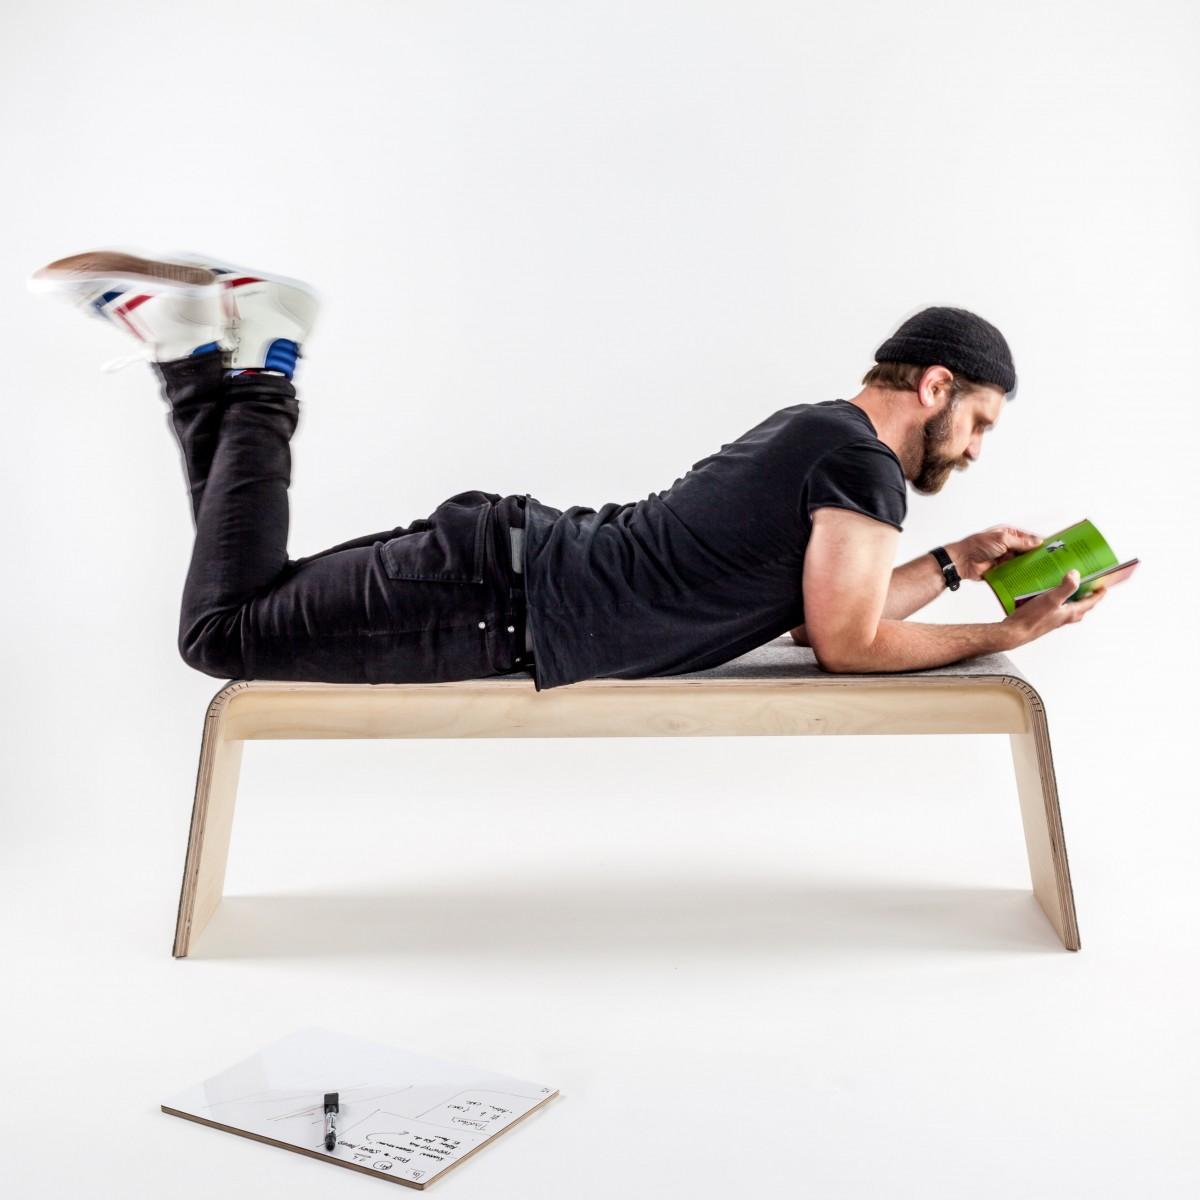 STADIG.stubenbank 140 Design Sitzbank aus Holz mit Wollfilz